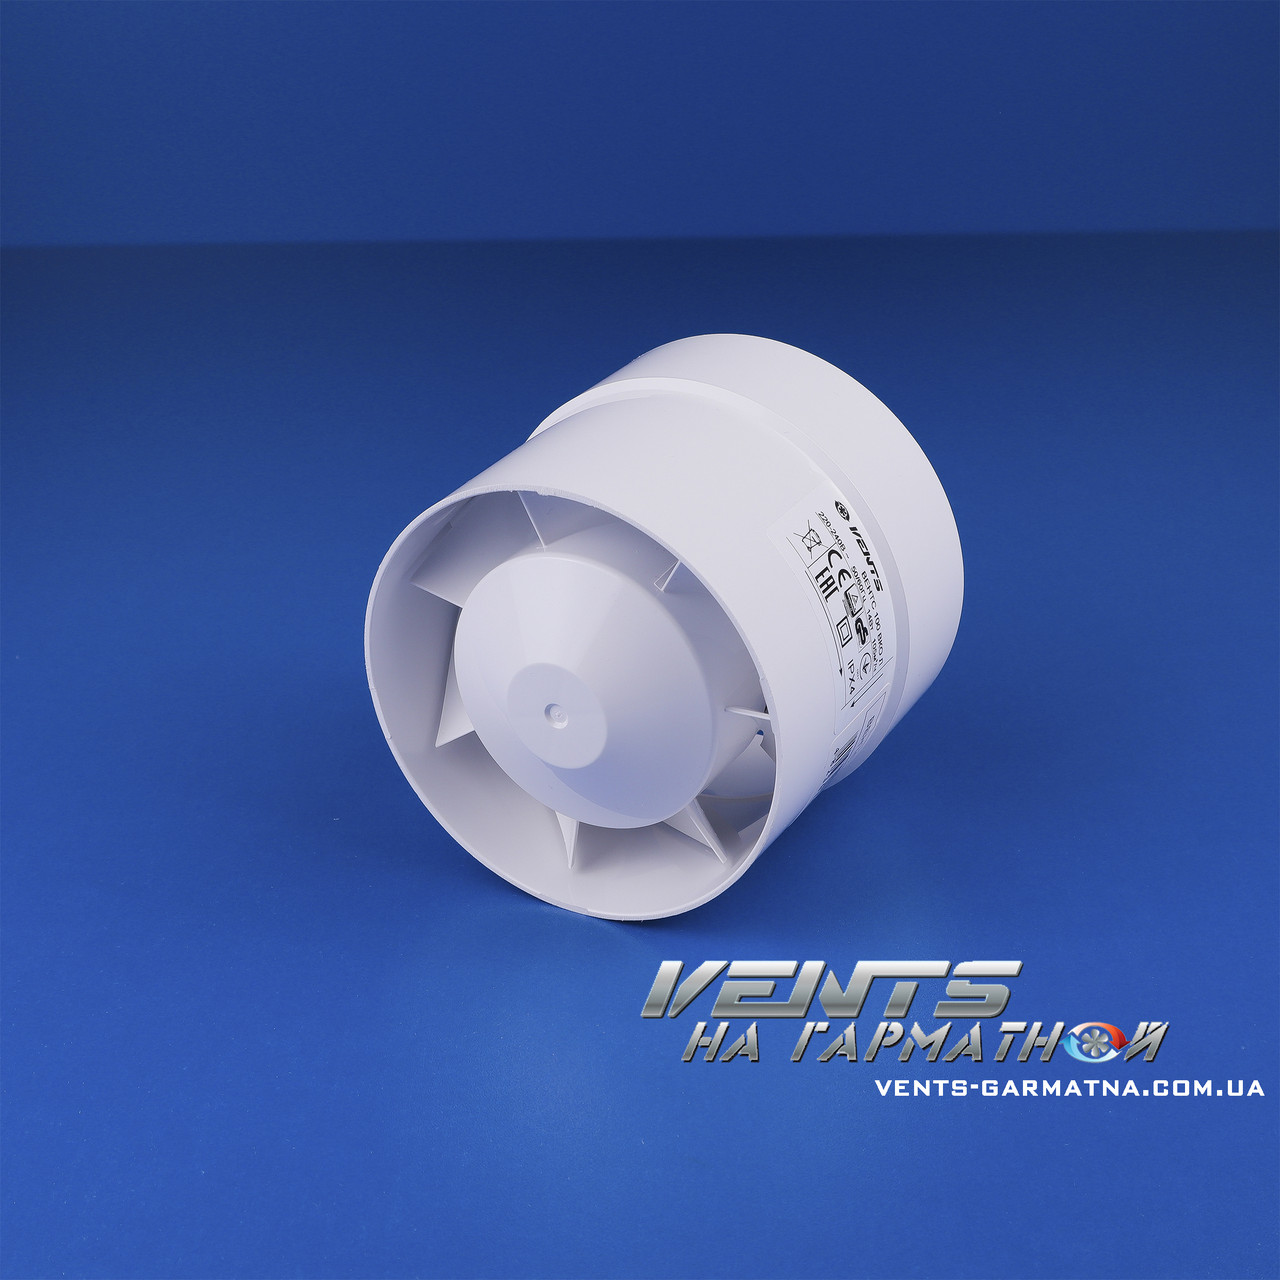 Вентс 100 ВКО Л (с металлическими подшипниками)